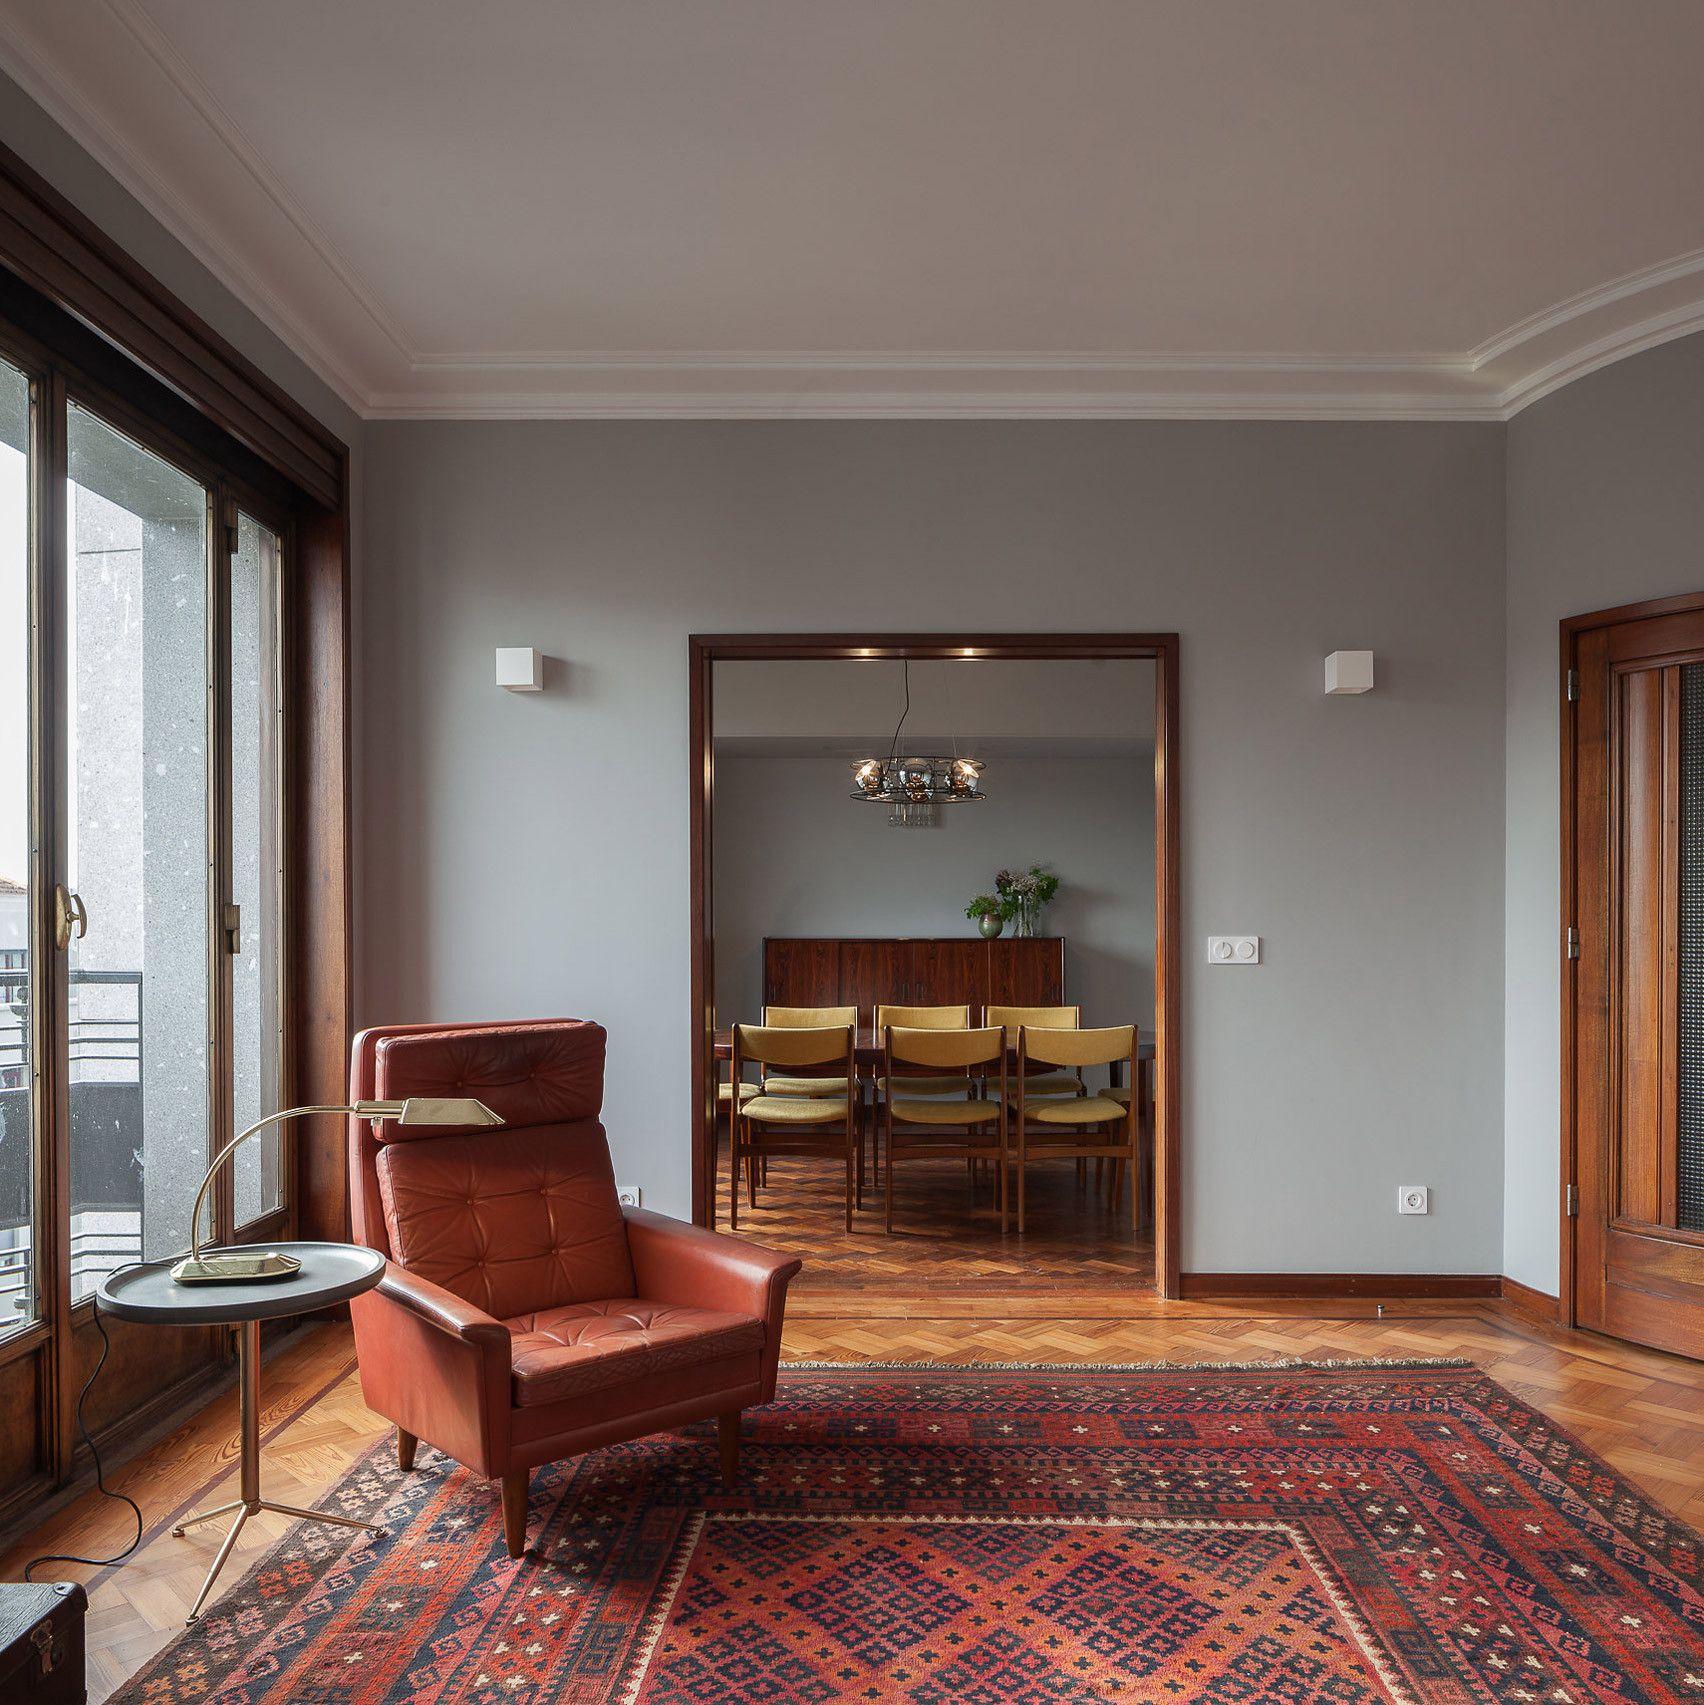 3 Dazzling Apartments With Retro Interiors In 1940s Porto Inspirational Interior Design Old Apartment Retro Apartment Retro Interior House Interior